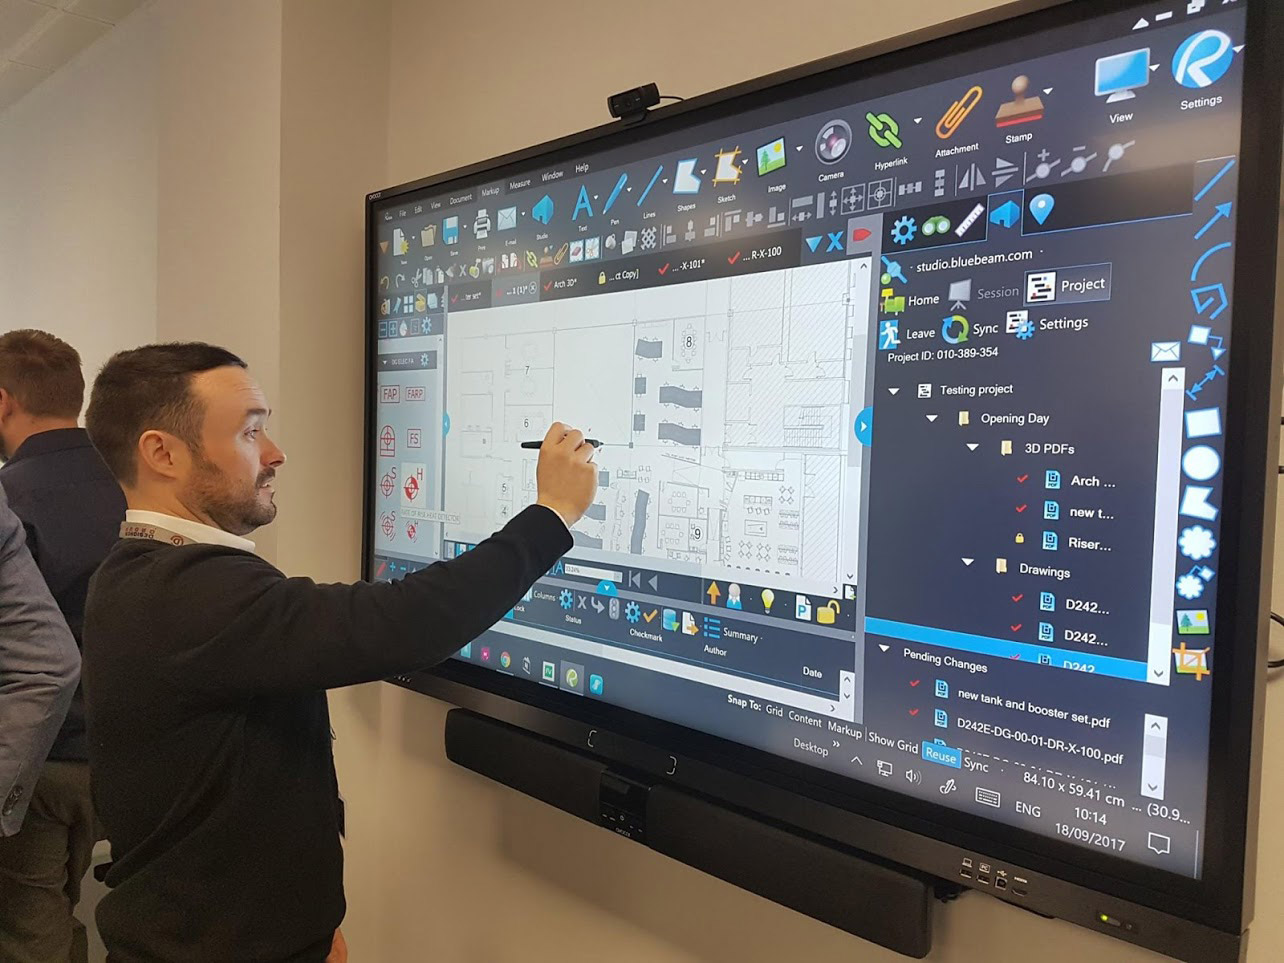 Avocor-collaboration-whiteboard